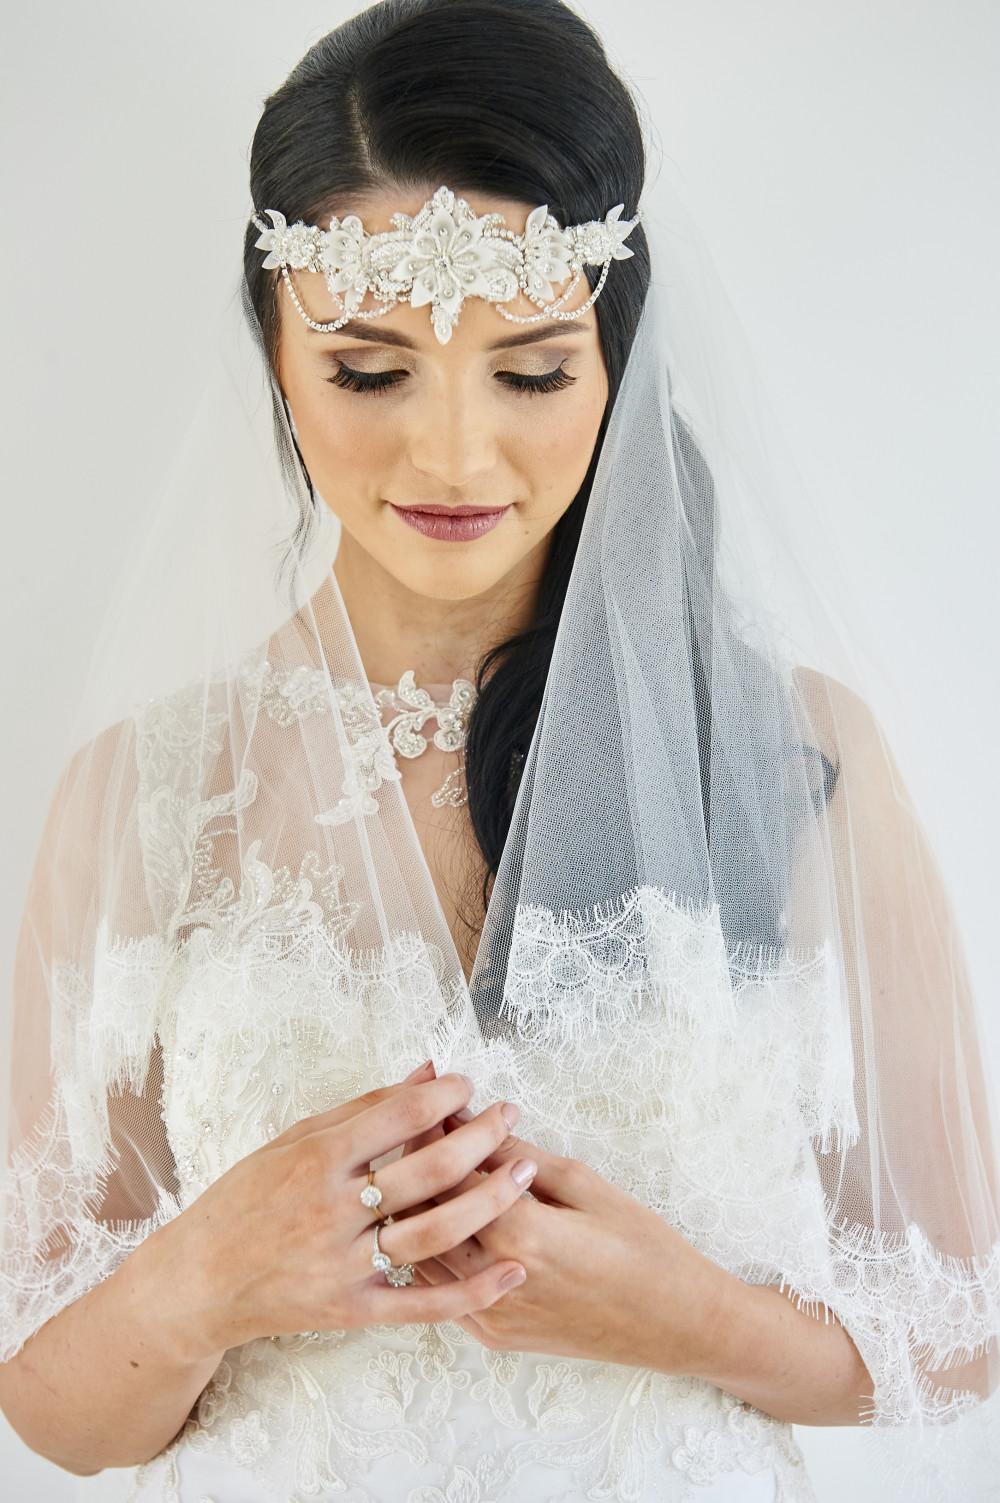 - Make Me Bridal Artist: Tara Sanger Makeup. Photography by: David wheeler photography.